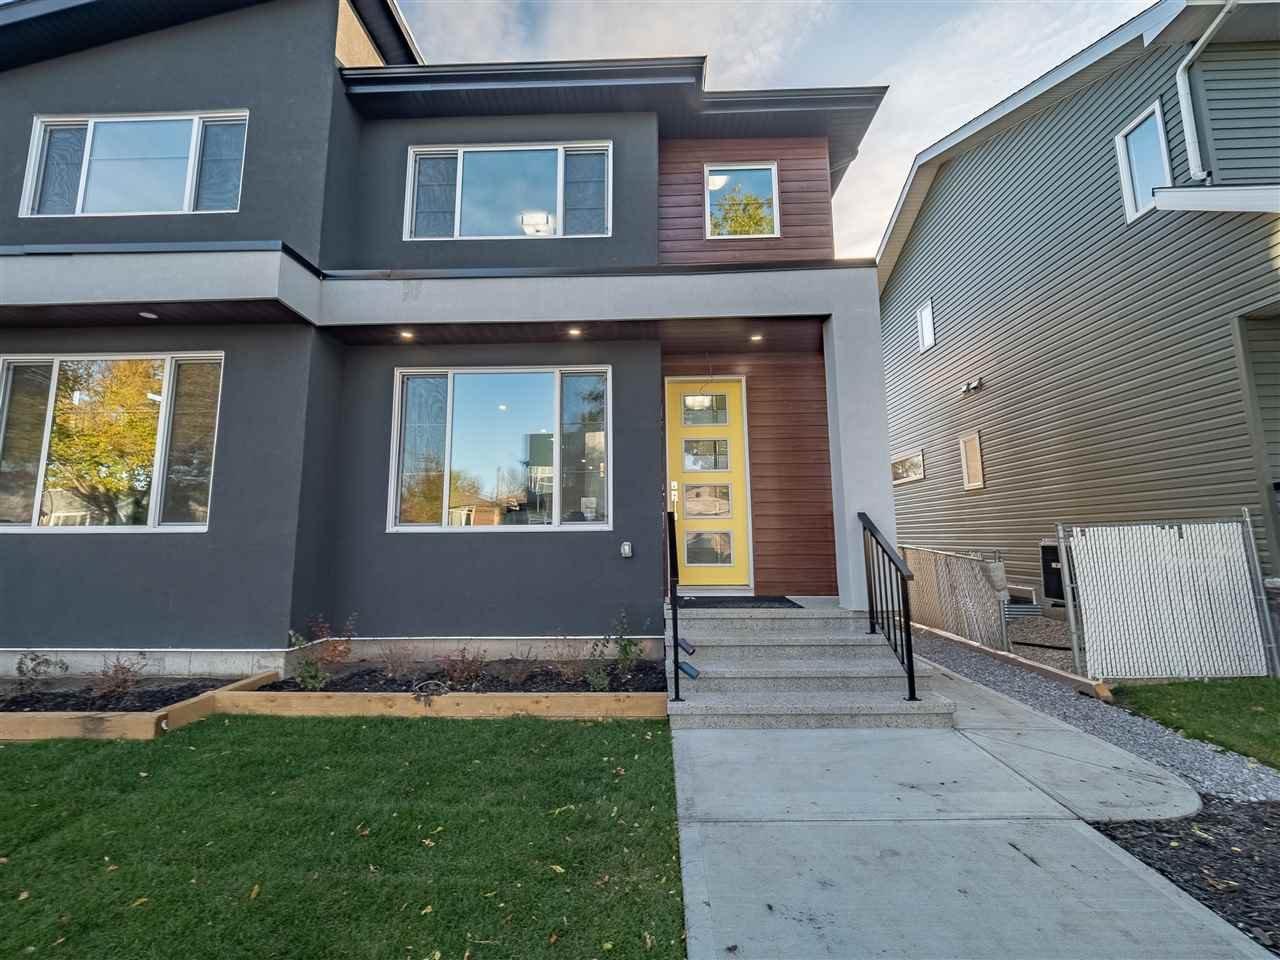 Main Photo: 8831 92 Street in Edmonton: Zone 18 House Half Duplex for sale : MLS®# E4177601